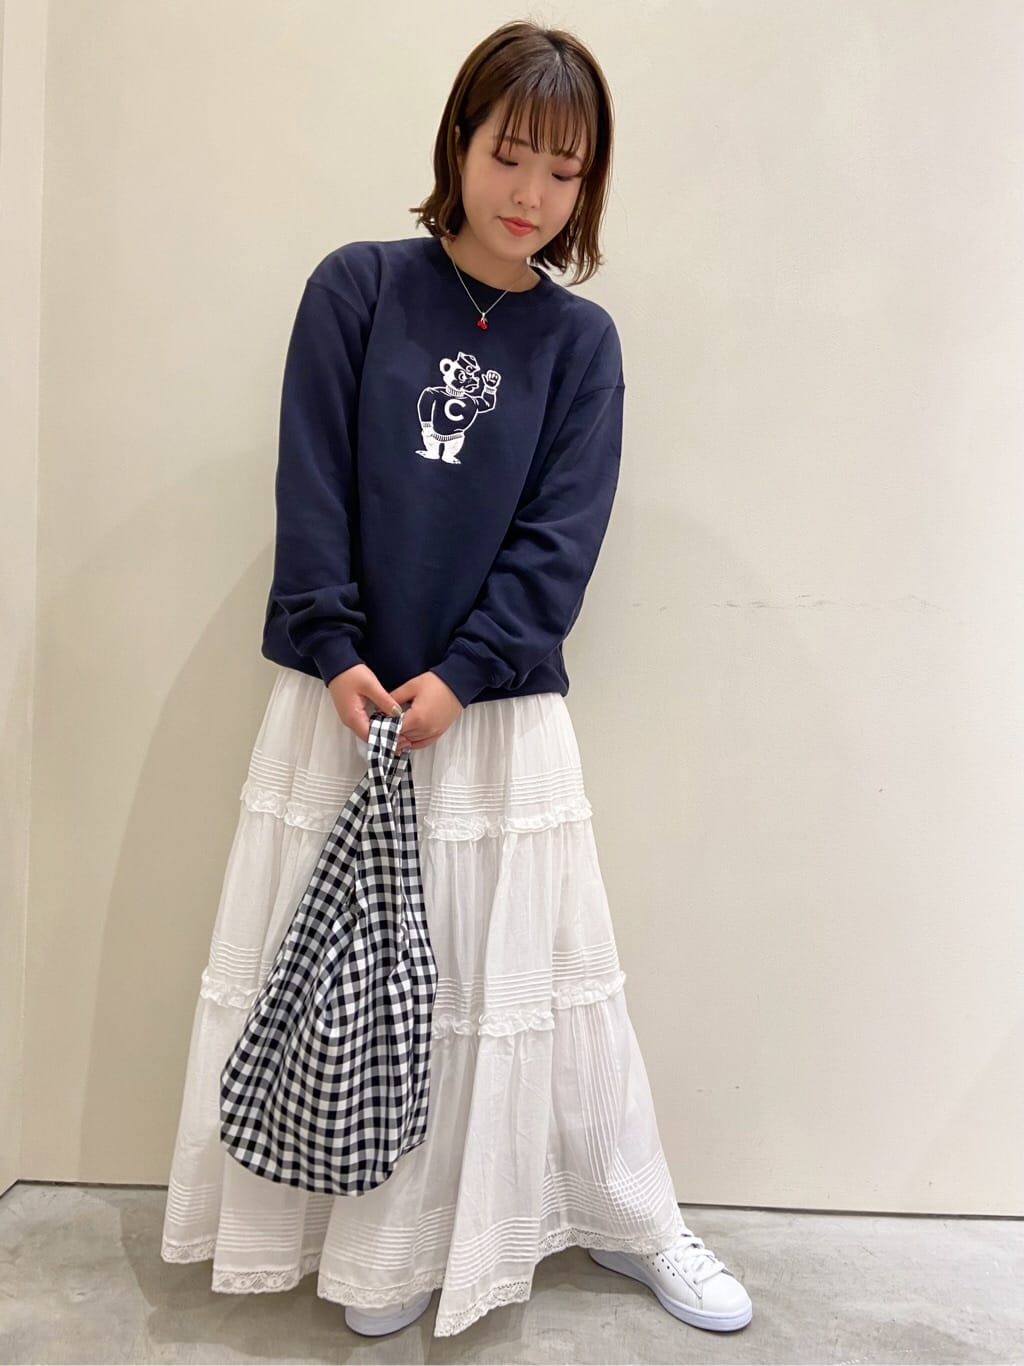 Dot and Stripes CHILD WOMAN CHILD WOMAN , PAR ICI 新宿ミロード 身長:160cm 2021.09.06